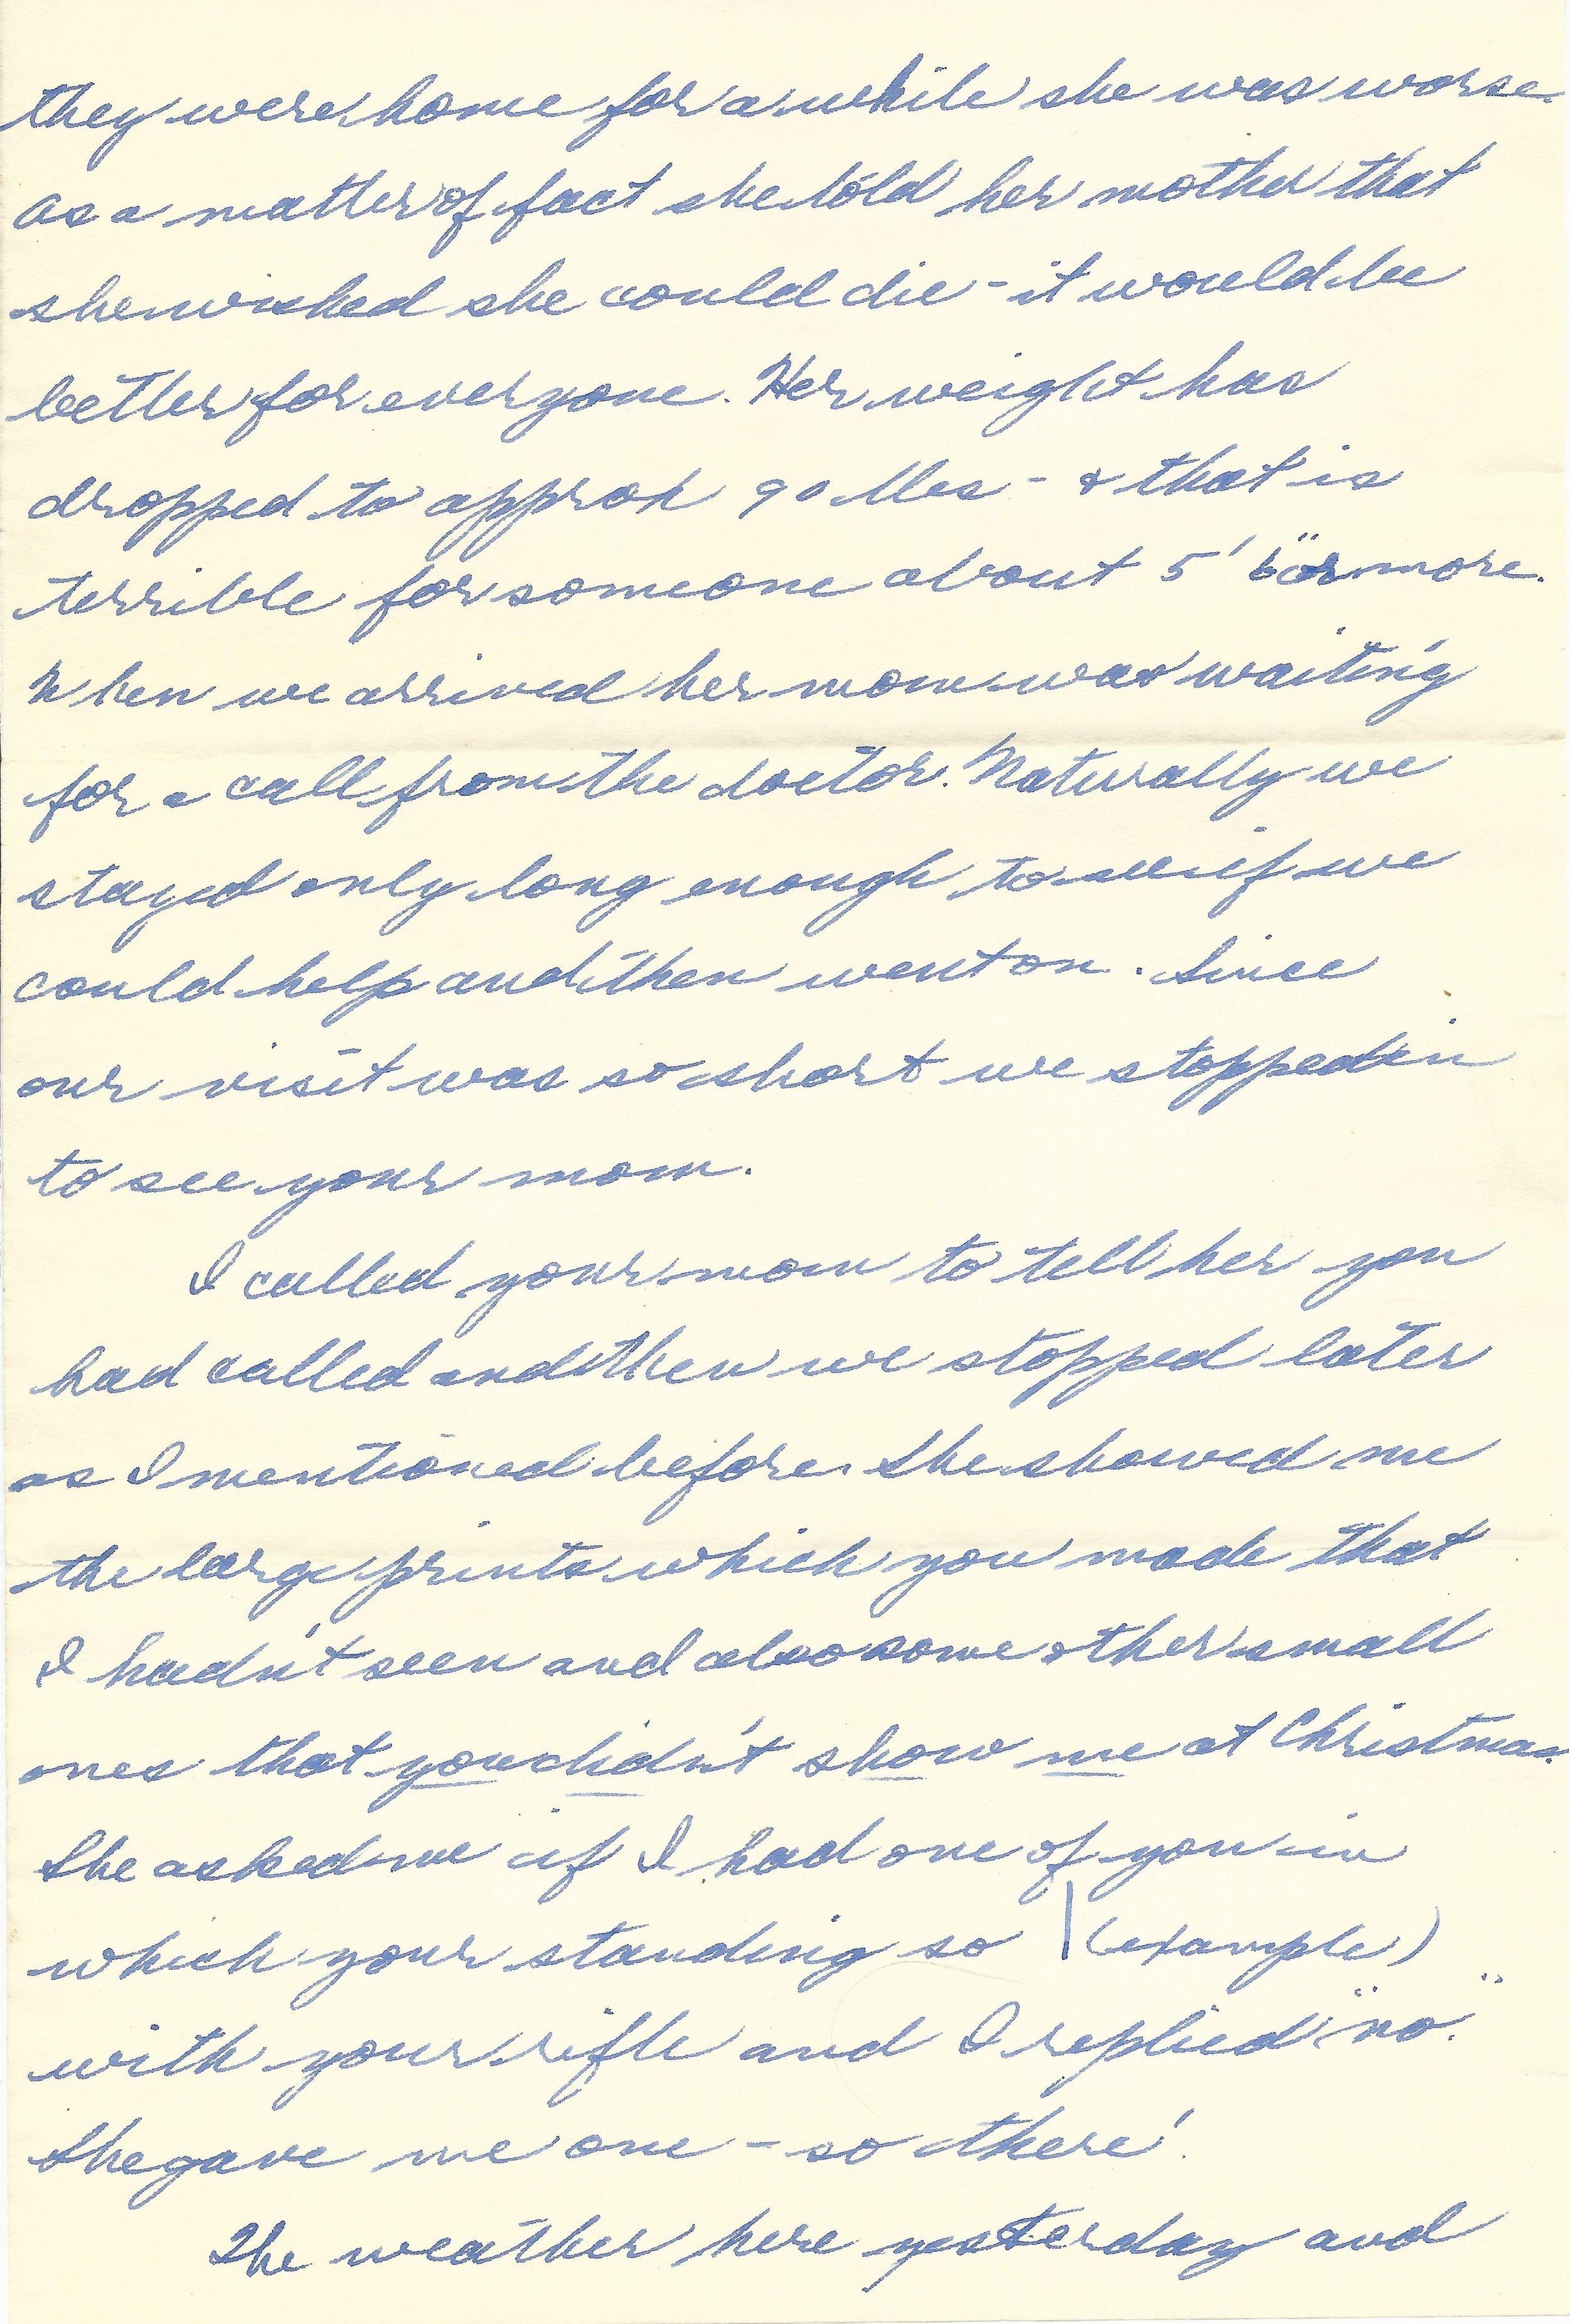 7. Jan. 13, 1953 (Oma)_Page_3.jpg